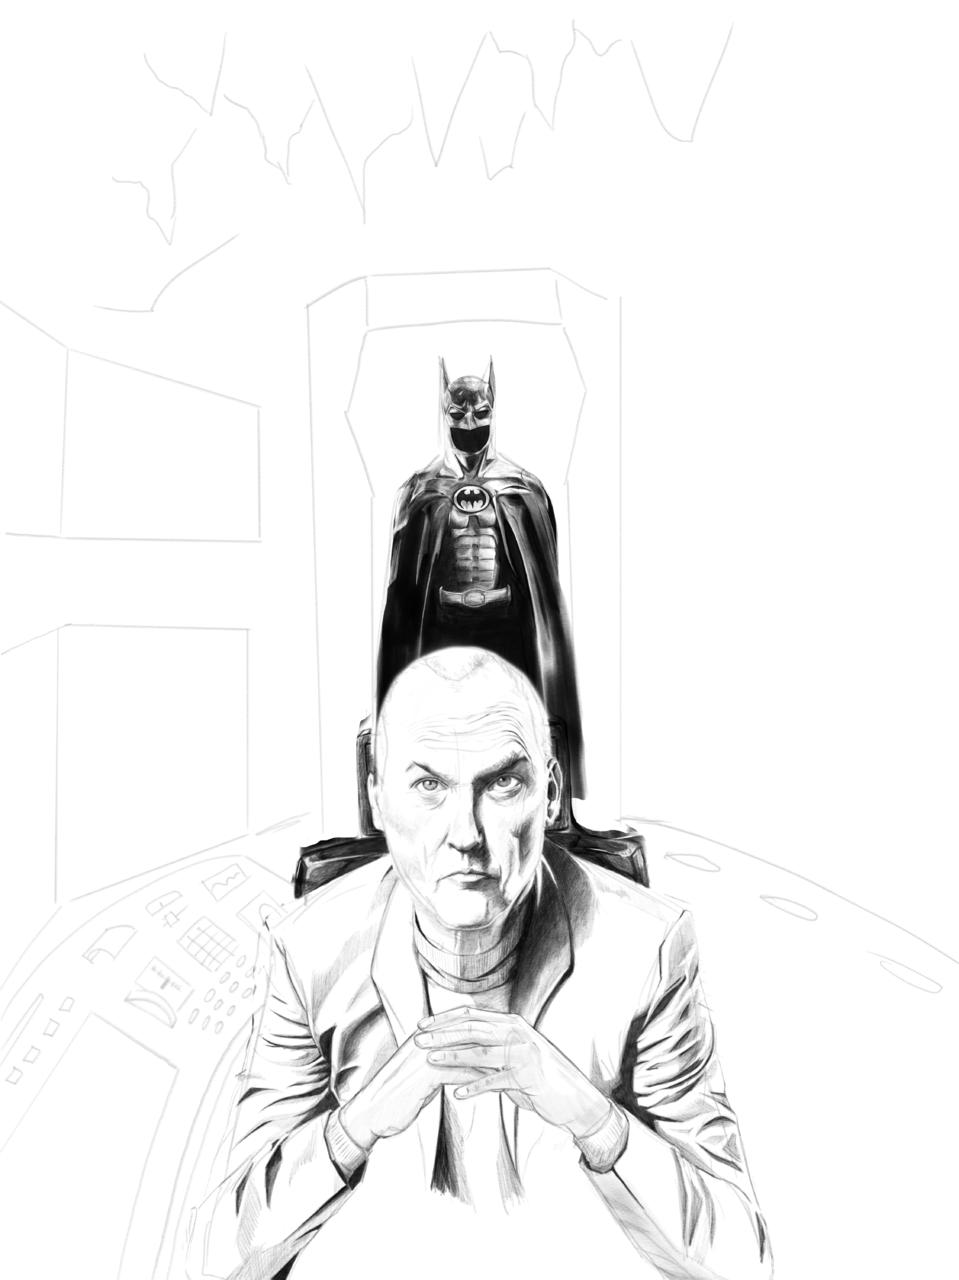 Batkeaton  Illust of Danfvm88 Post_Multiple_Images_Contest Batman